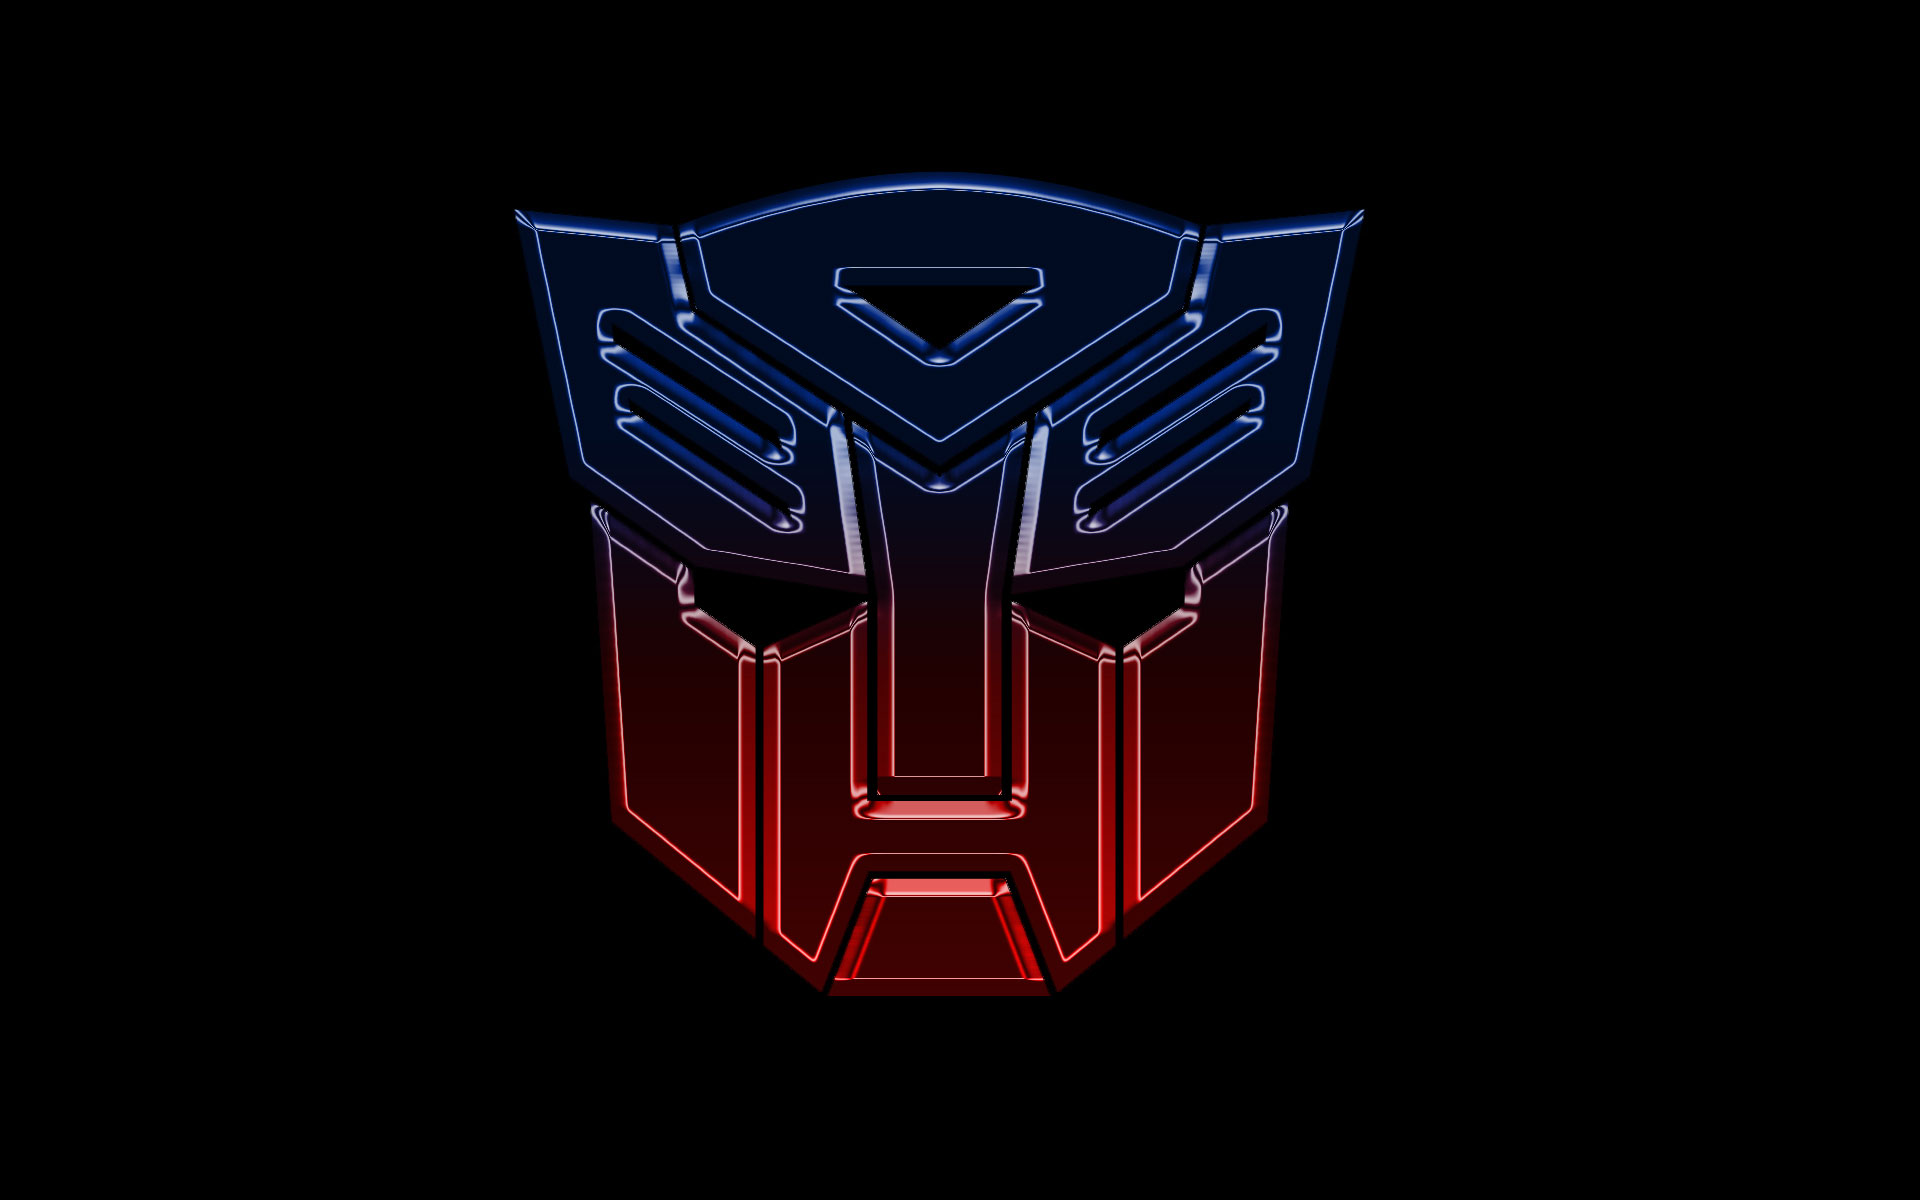 transformers wallpaper widescreen - photo #24